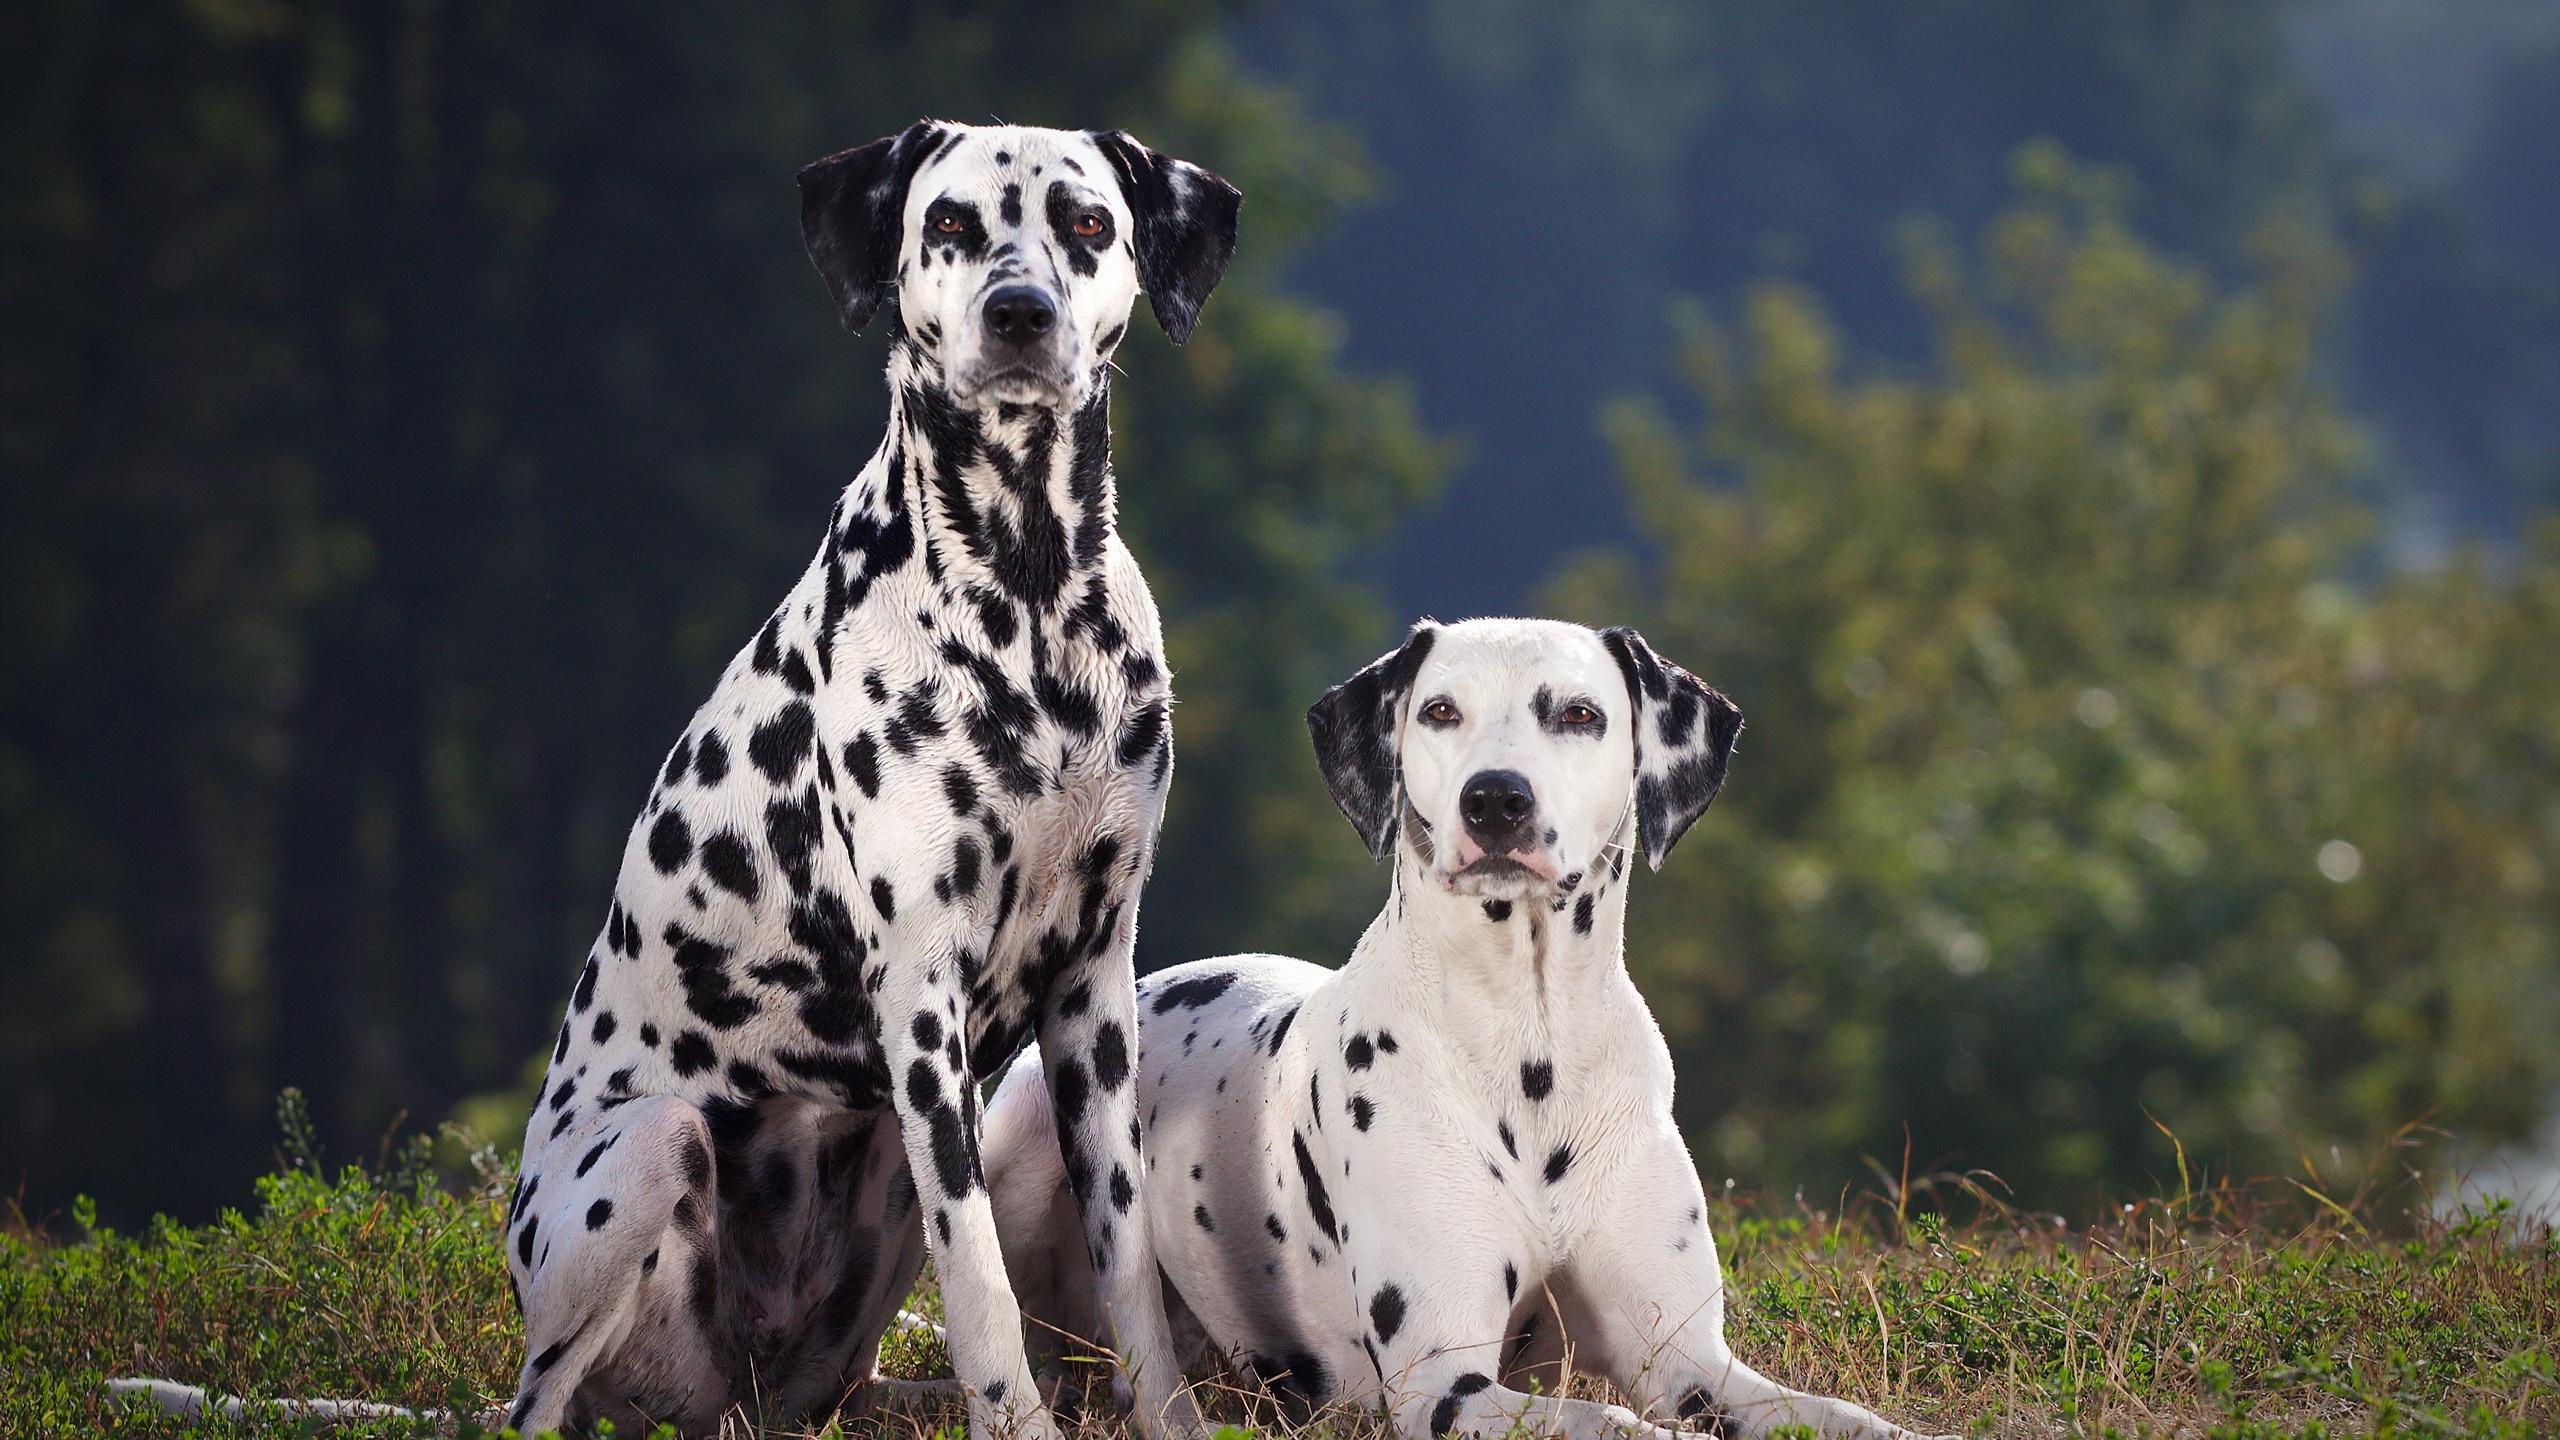 Fonds d 39 cran t l charger 2560x1440 deux chien dalmatien for Fond ecran qhd